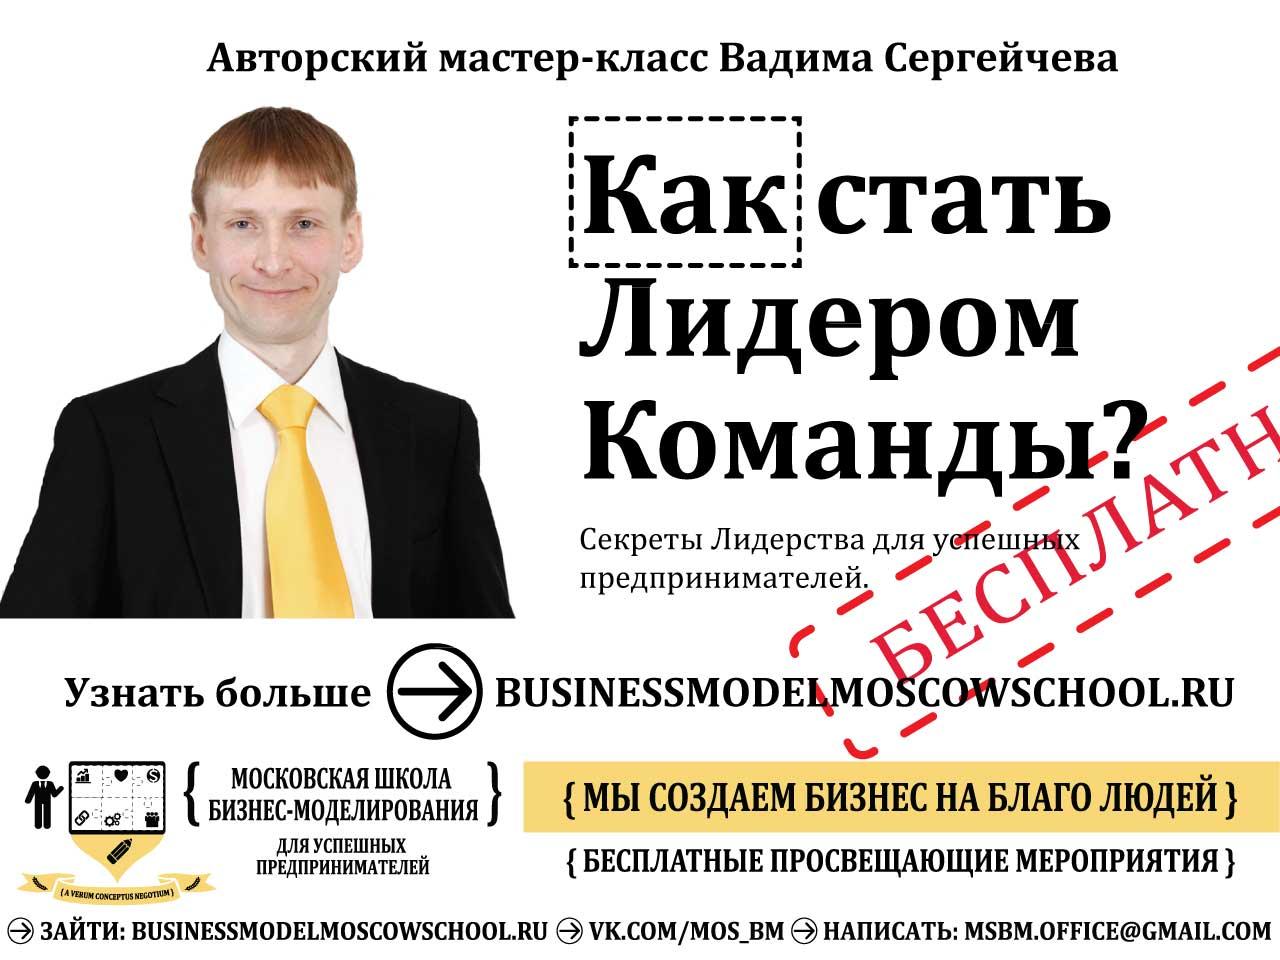 business_model_moscow_school_mclass_NEW_flyer_1.2_LEADER